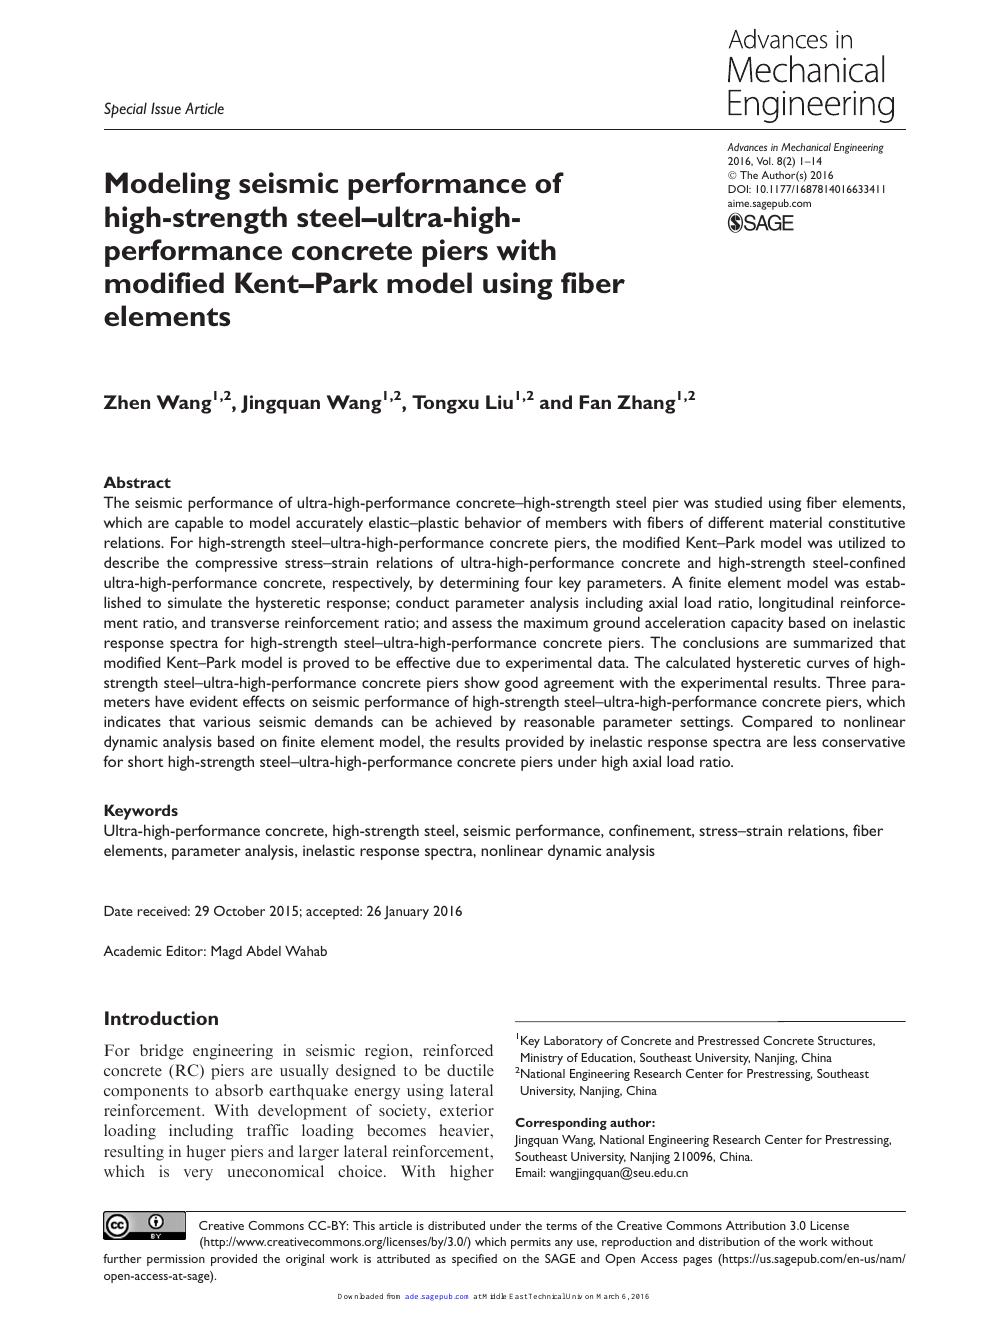 Modeling seismic performance of high-strength steel-ultra